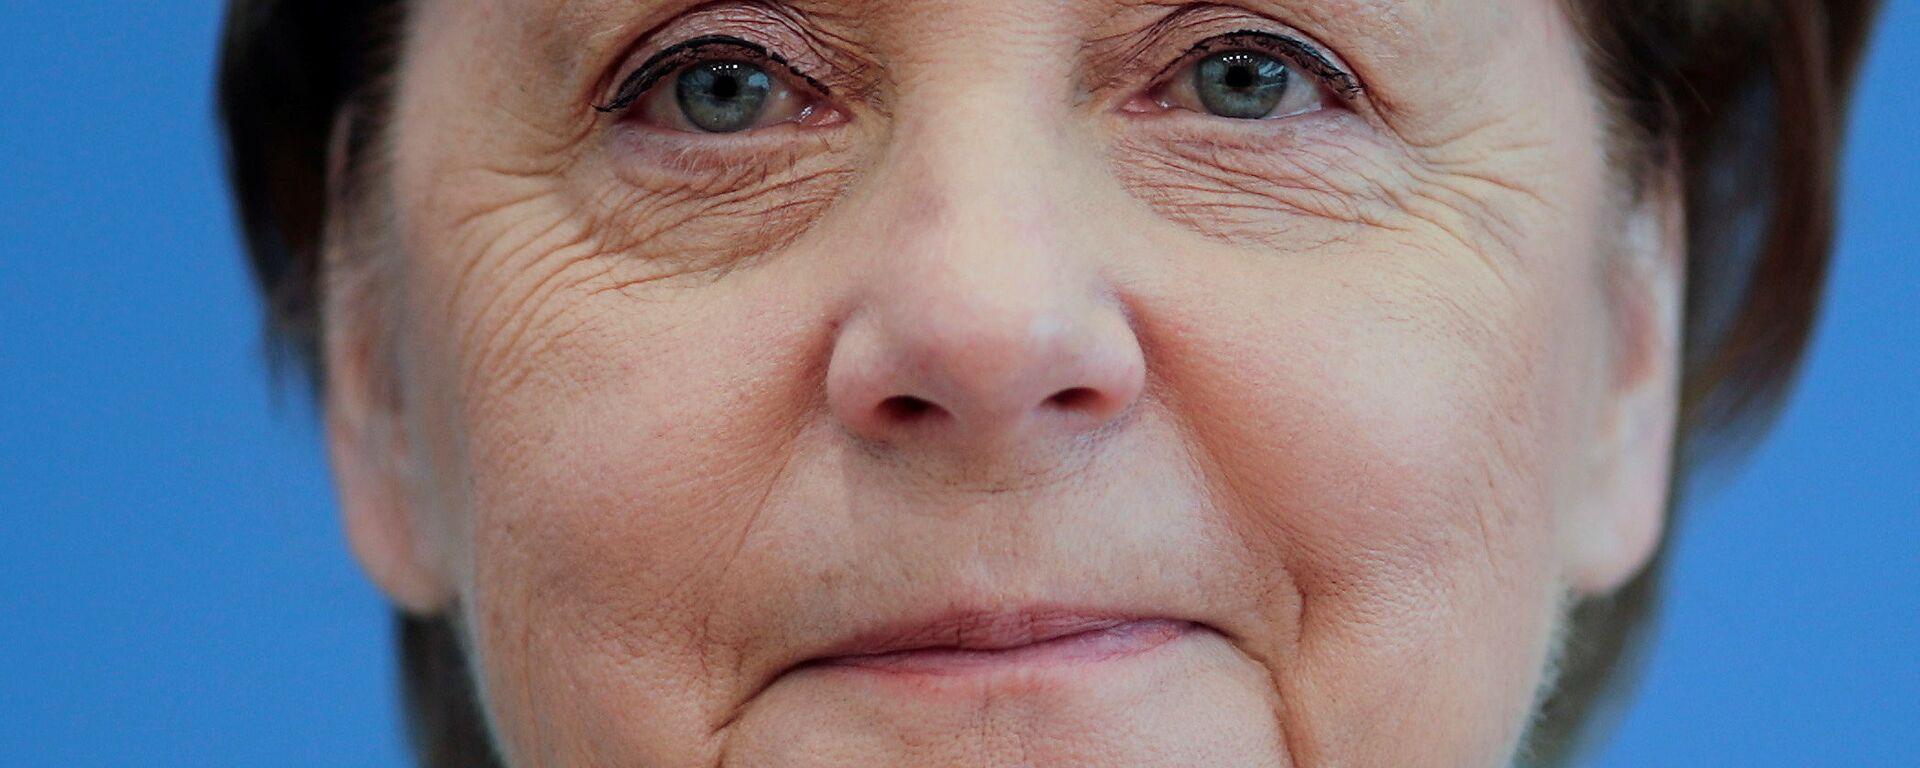 Angela Merkel - Sputnik Türkiye, 1920, 14.09.2021